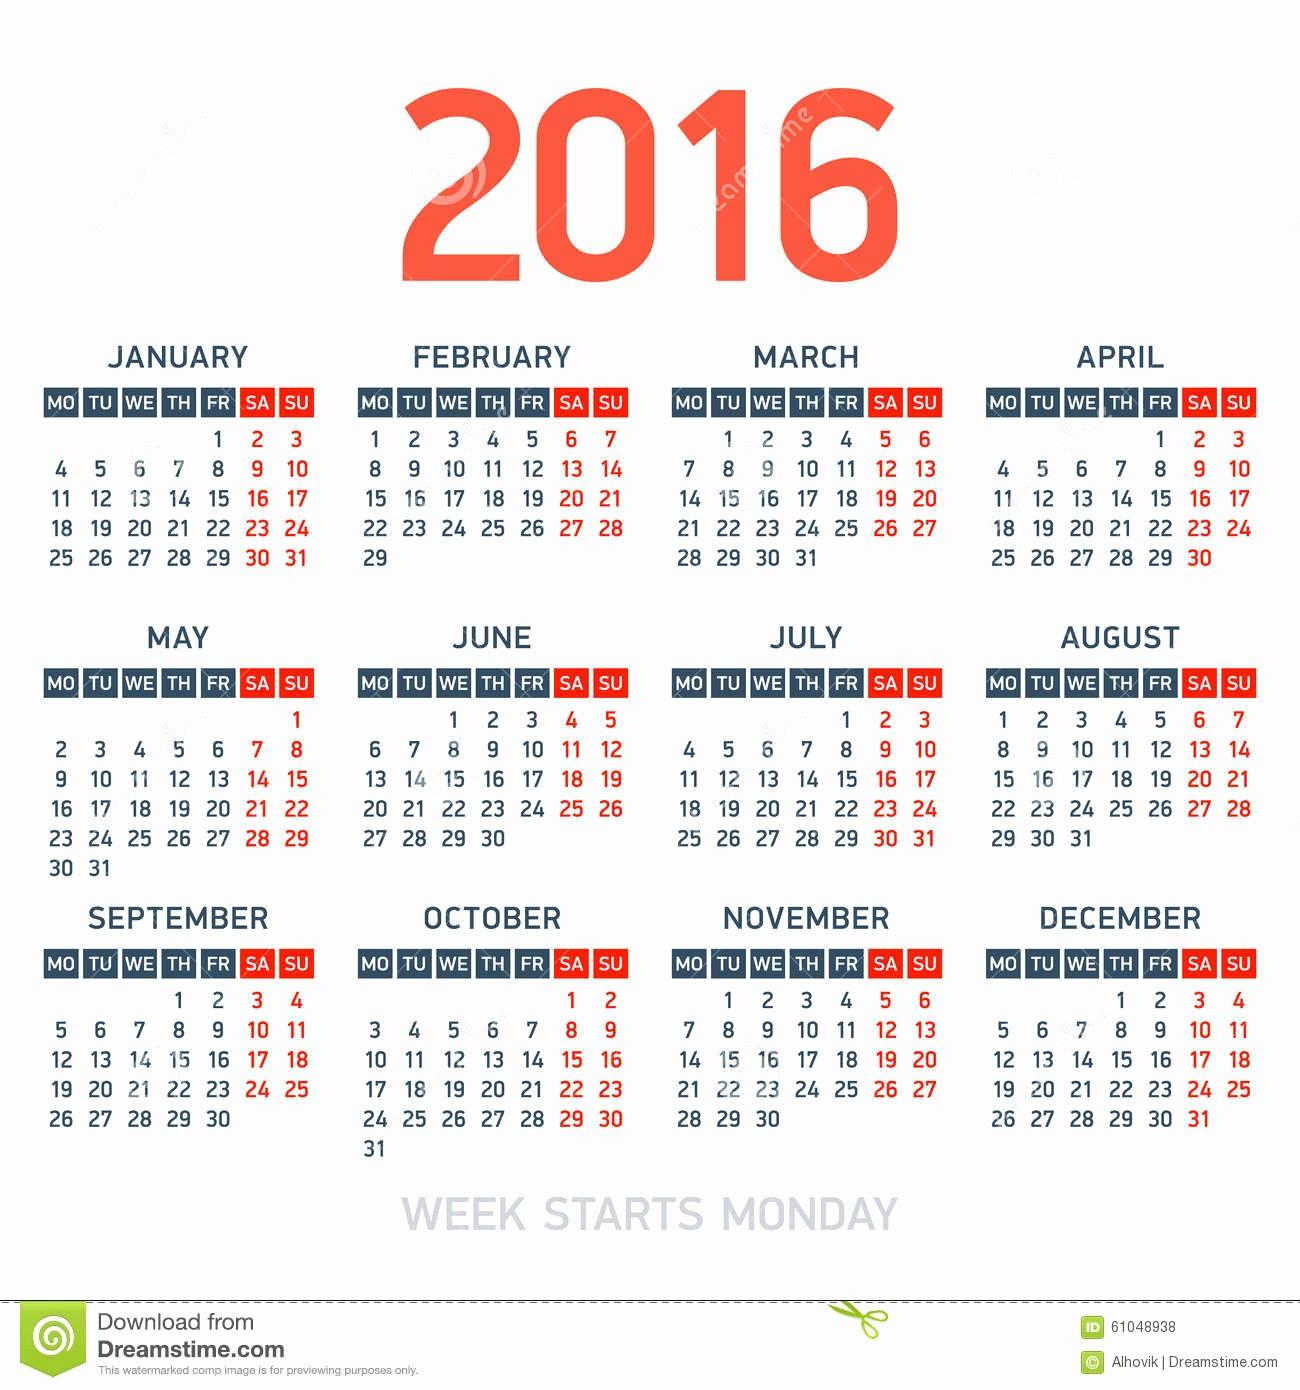 Weekly Calendar Starting with Monday Inspirational Calendar 2016 Stock Vector Image